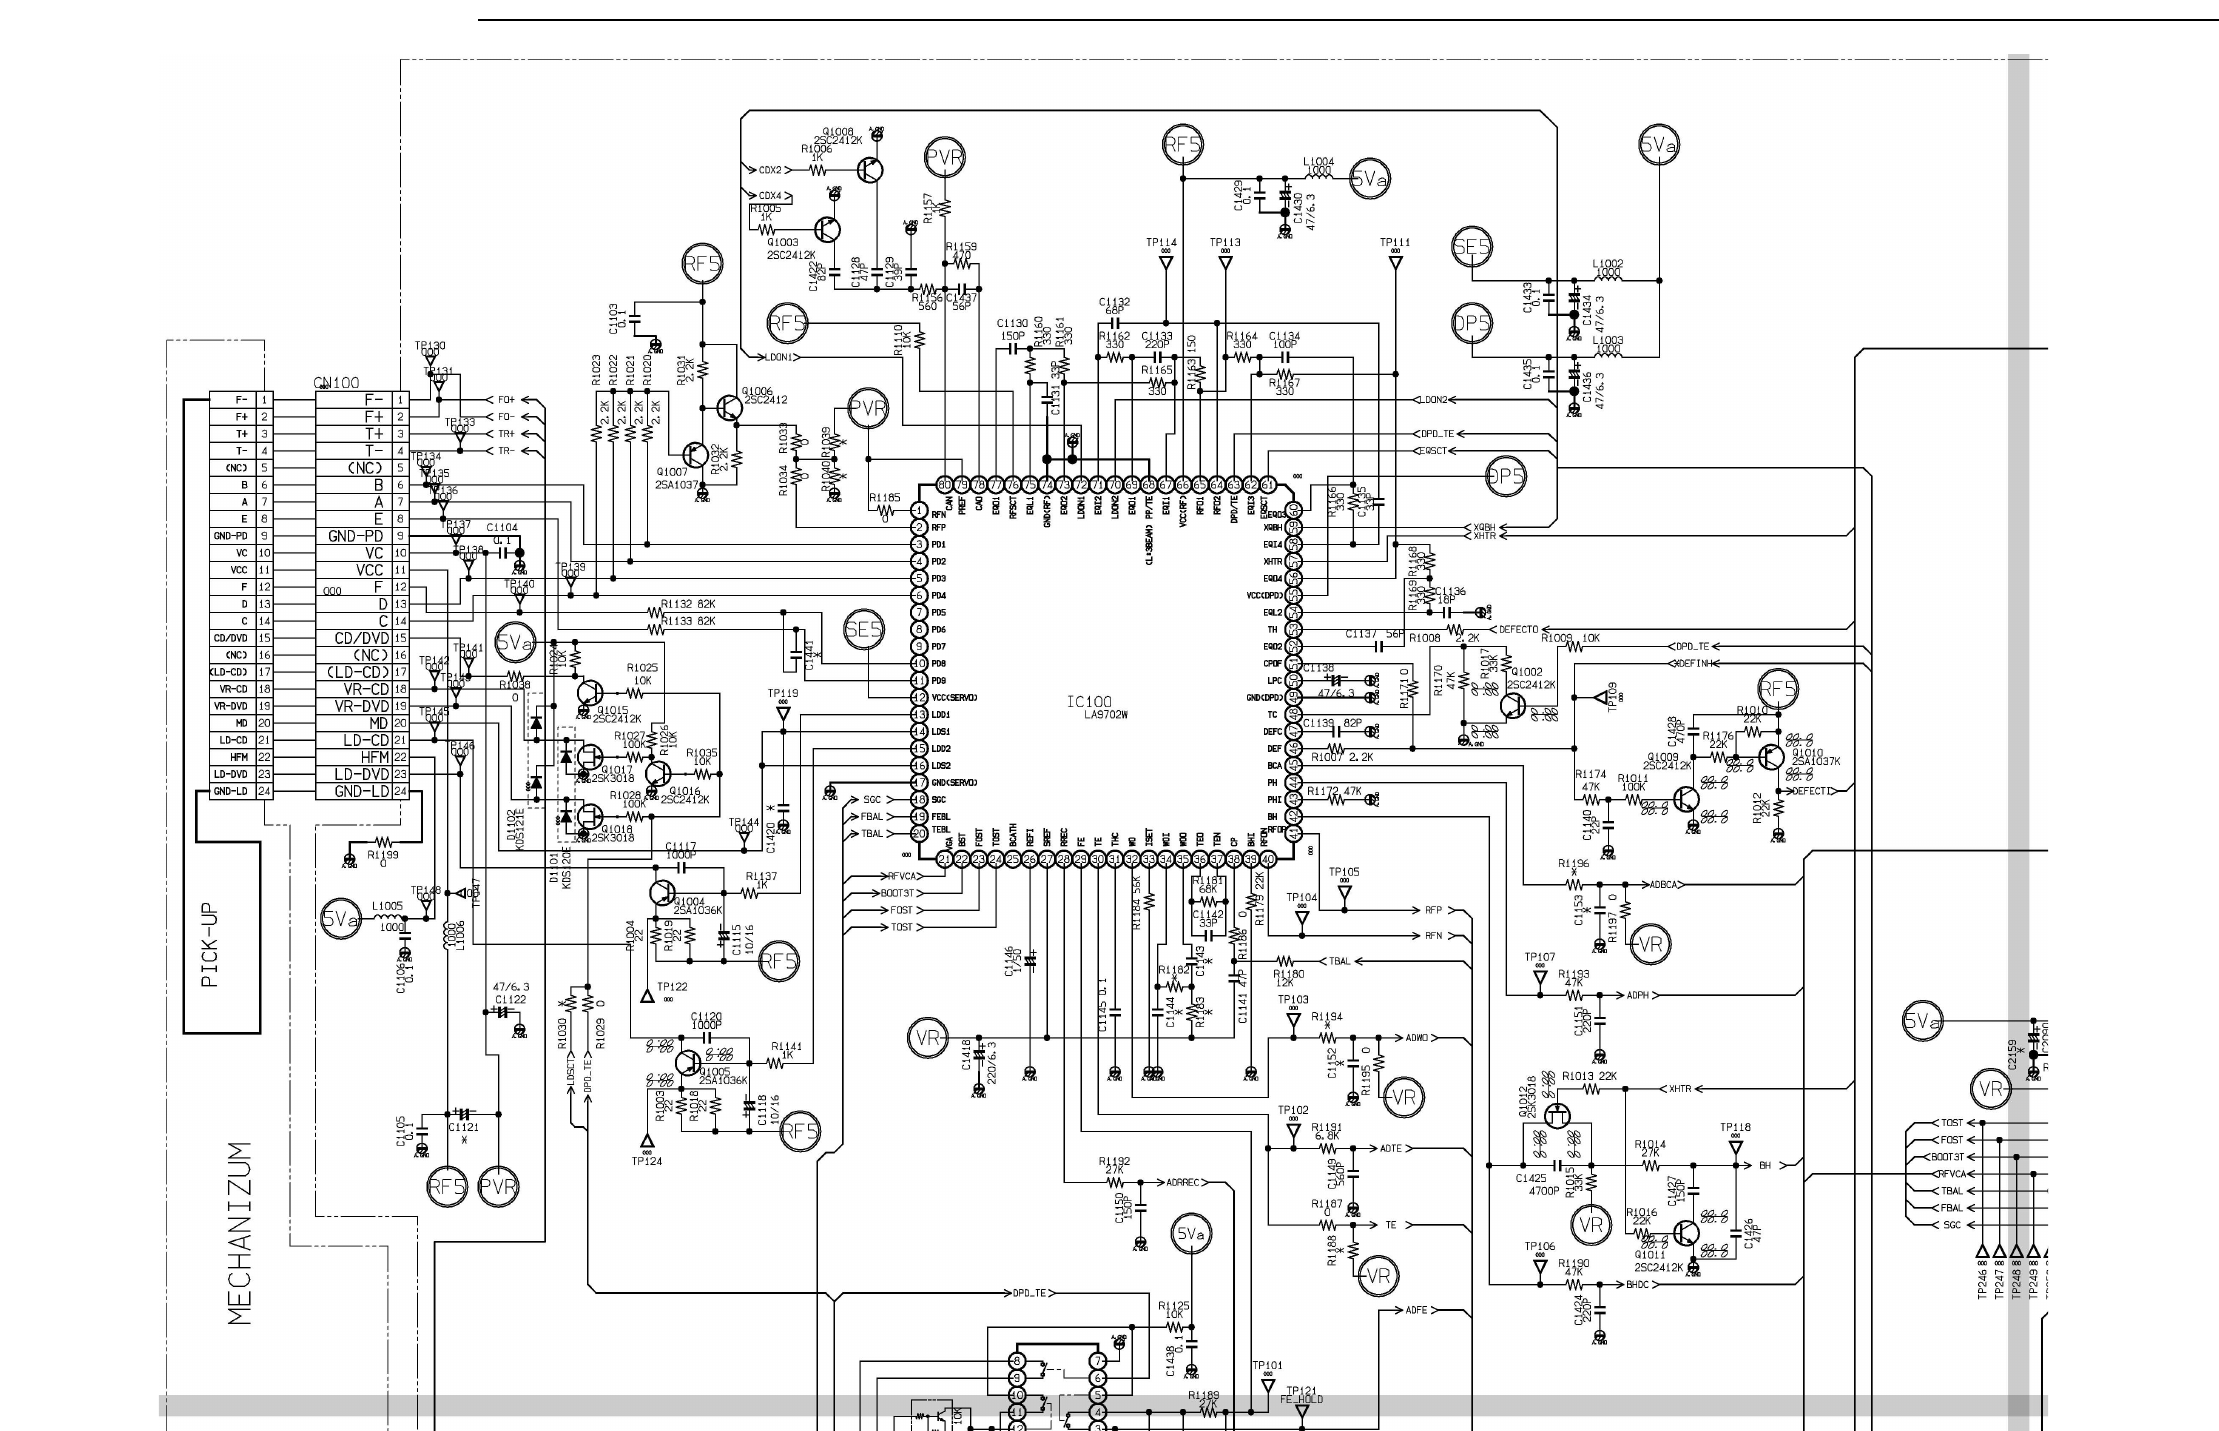 Dvd7201 Circuit Diagram For Dvd Servo Control Schematic Diagramdvd Top Left